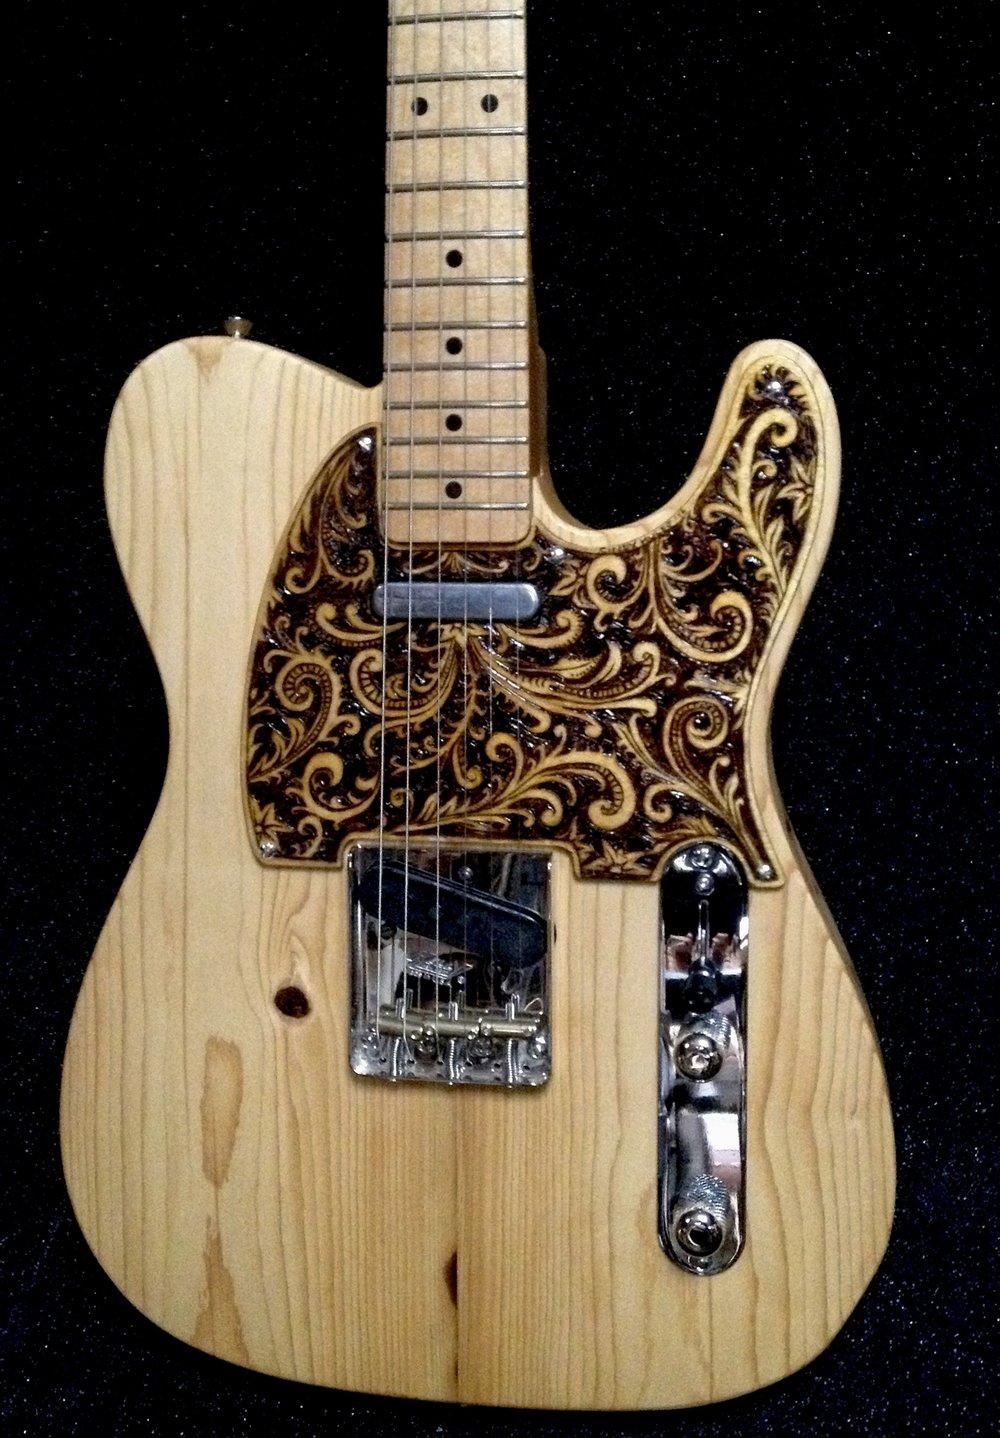 Pyrography guitar